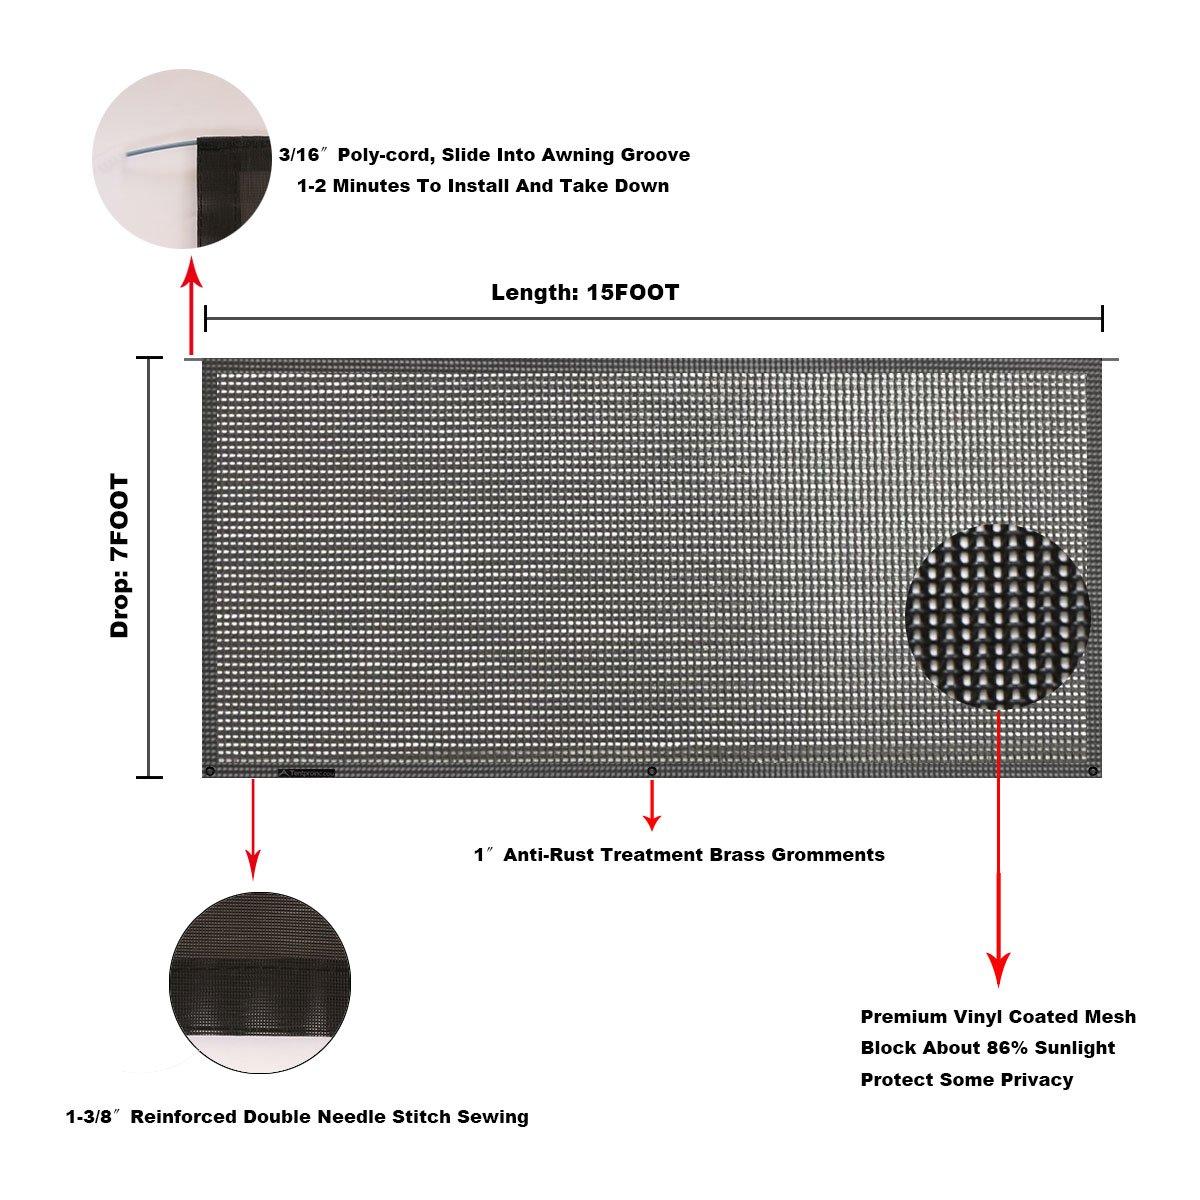 Tentproinc RV Awning Shade Screen 7X19 Gift Blue Sunshade Camping Trailer UV Sun Blocker Complete Kits 3 Years Limited Warranty